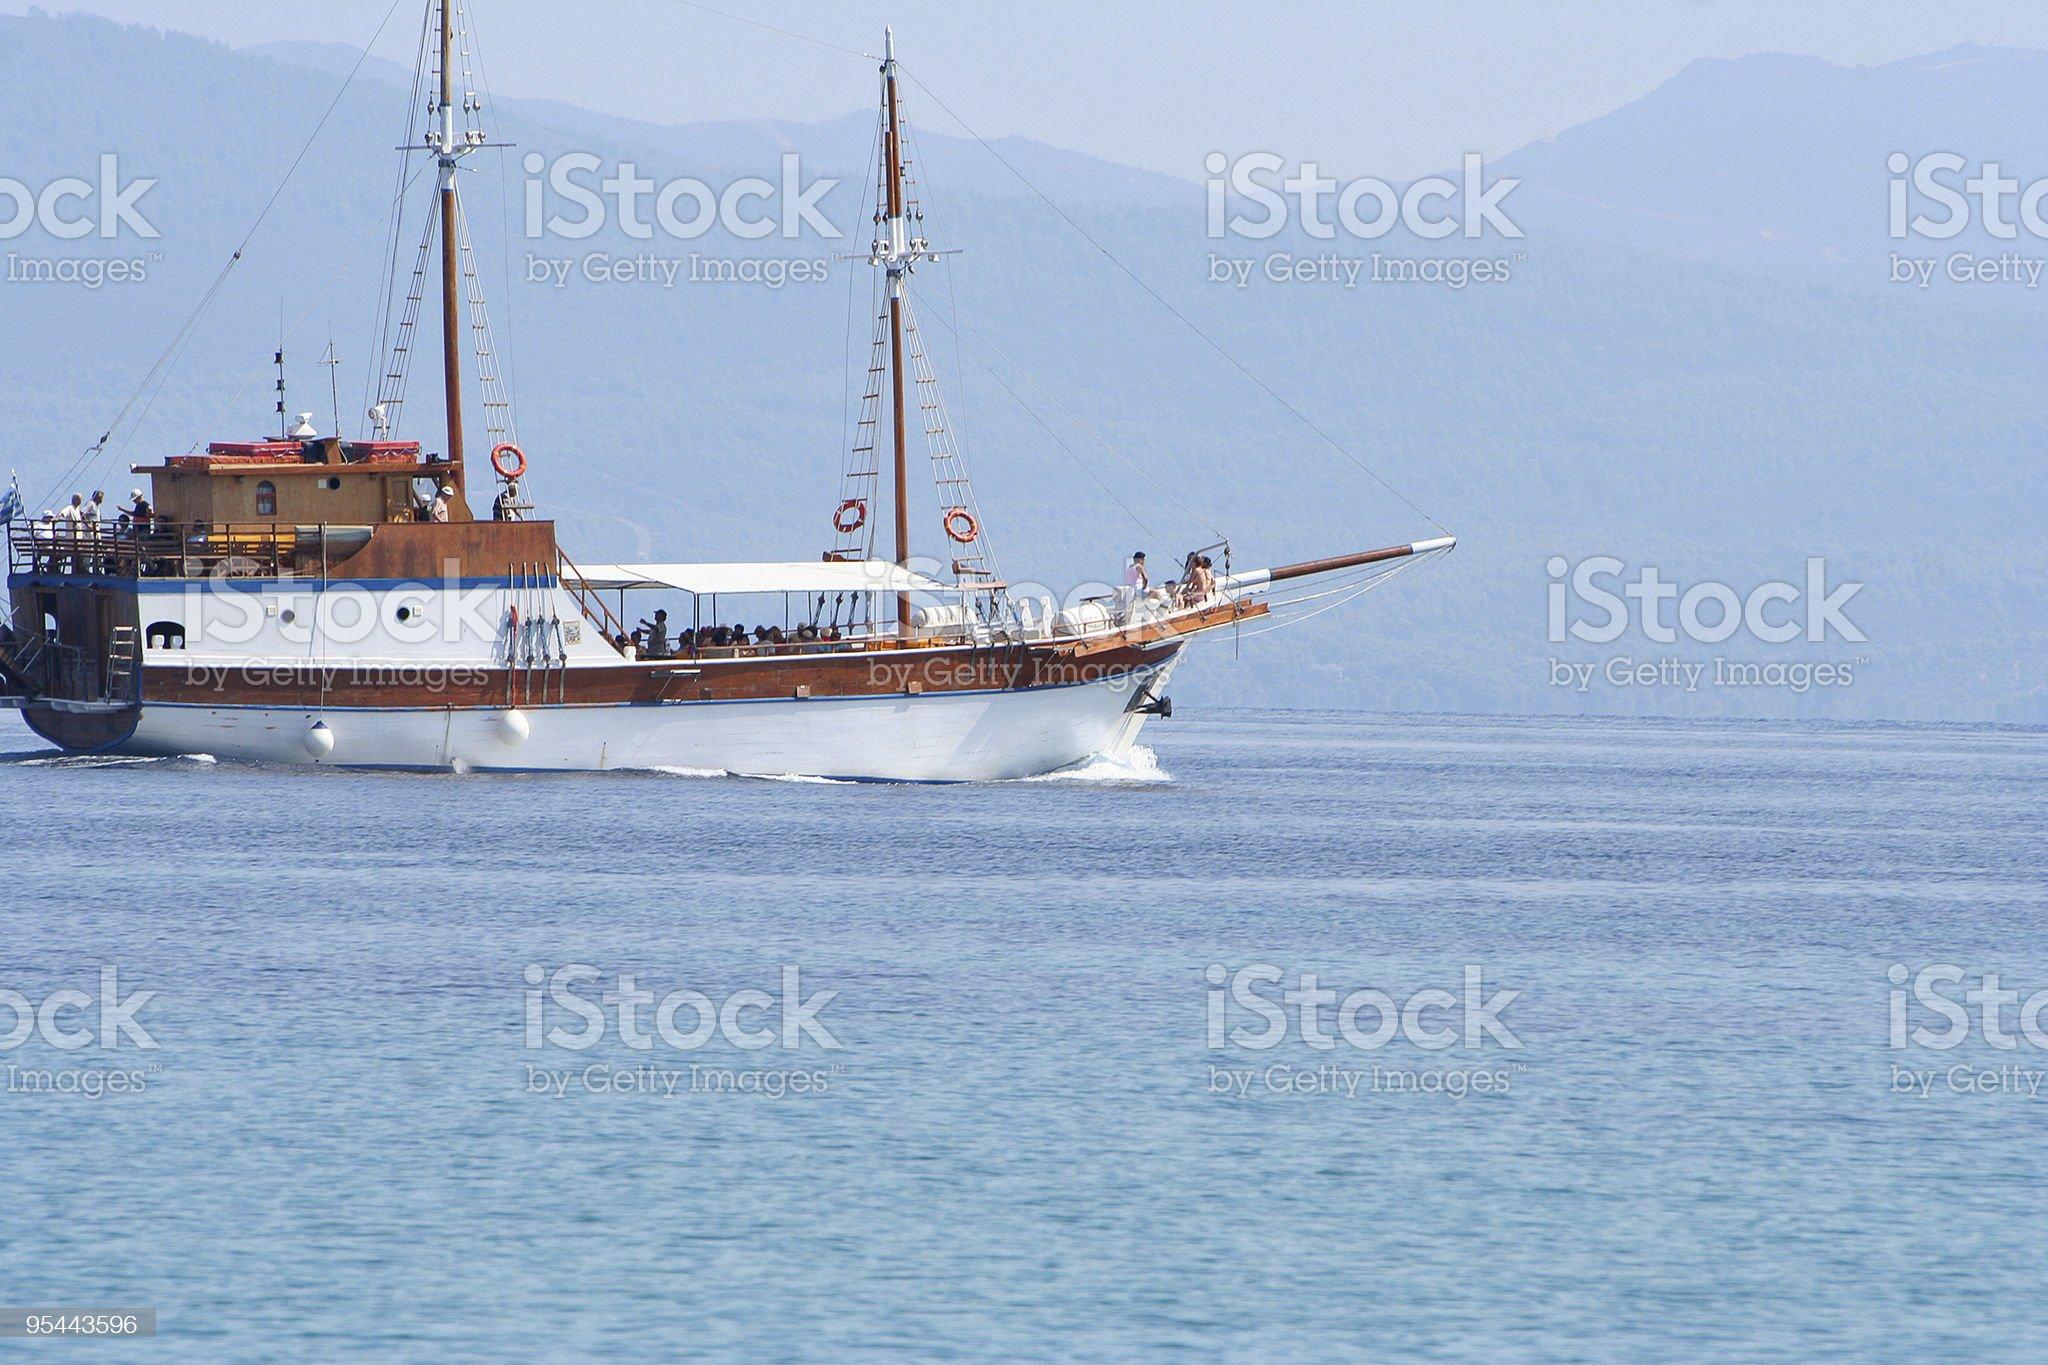 Sailer royalty-free stock photo